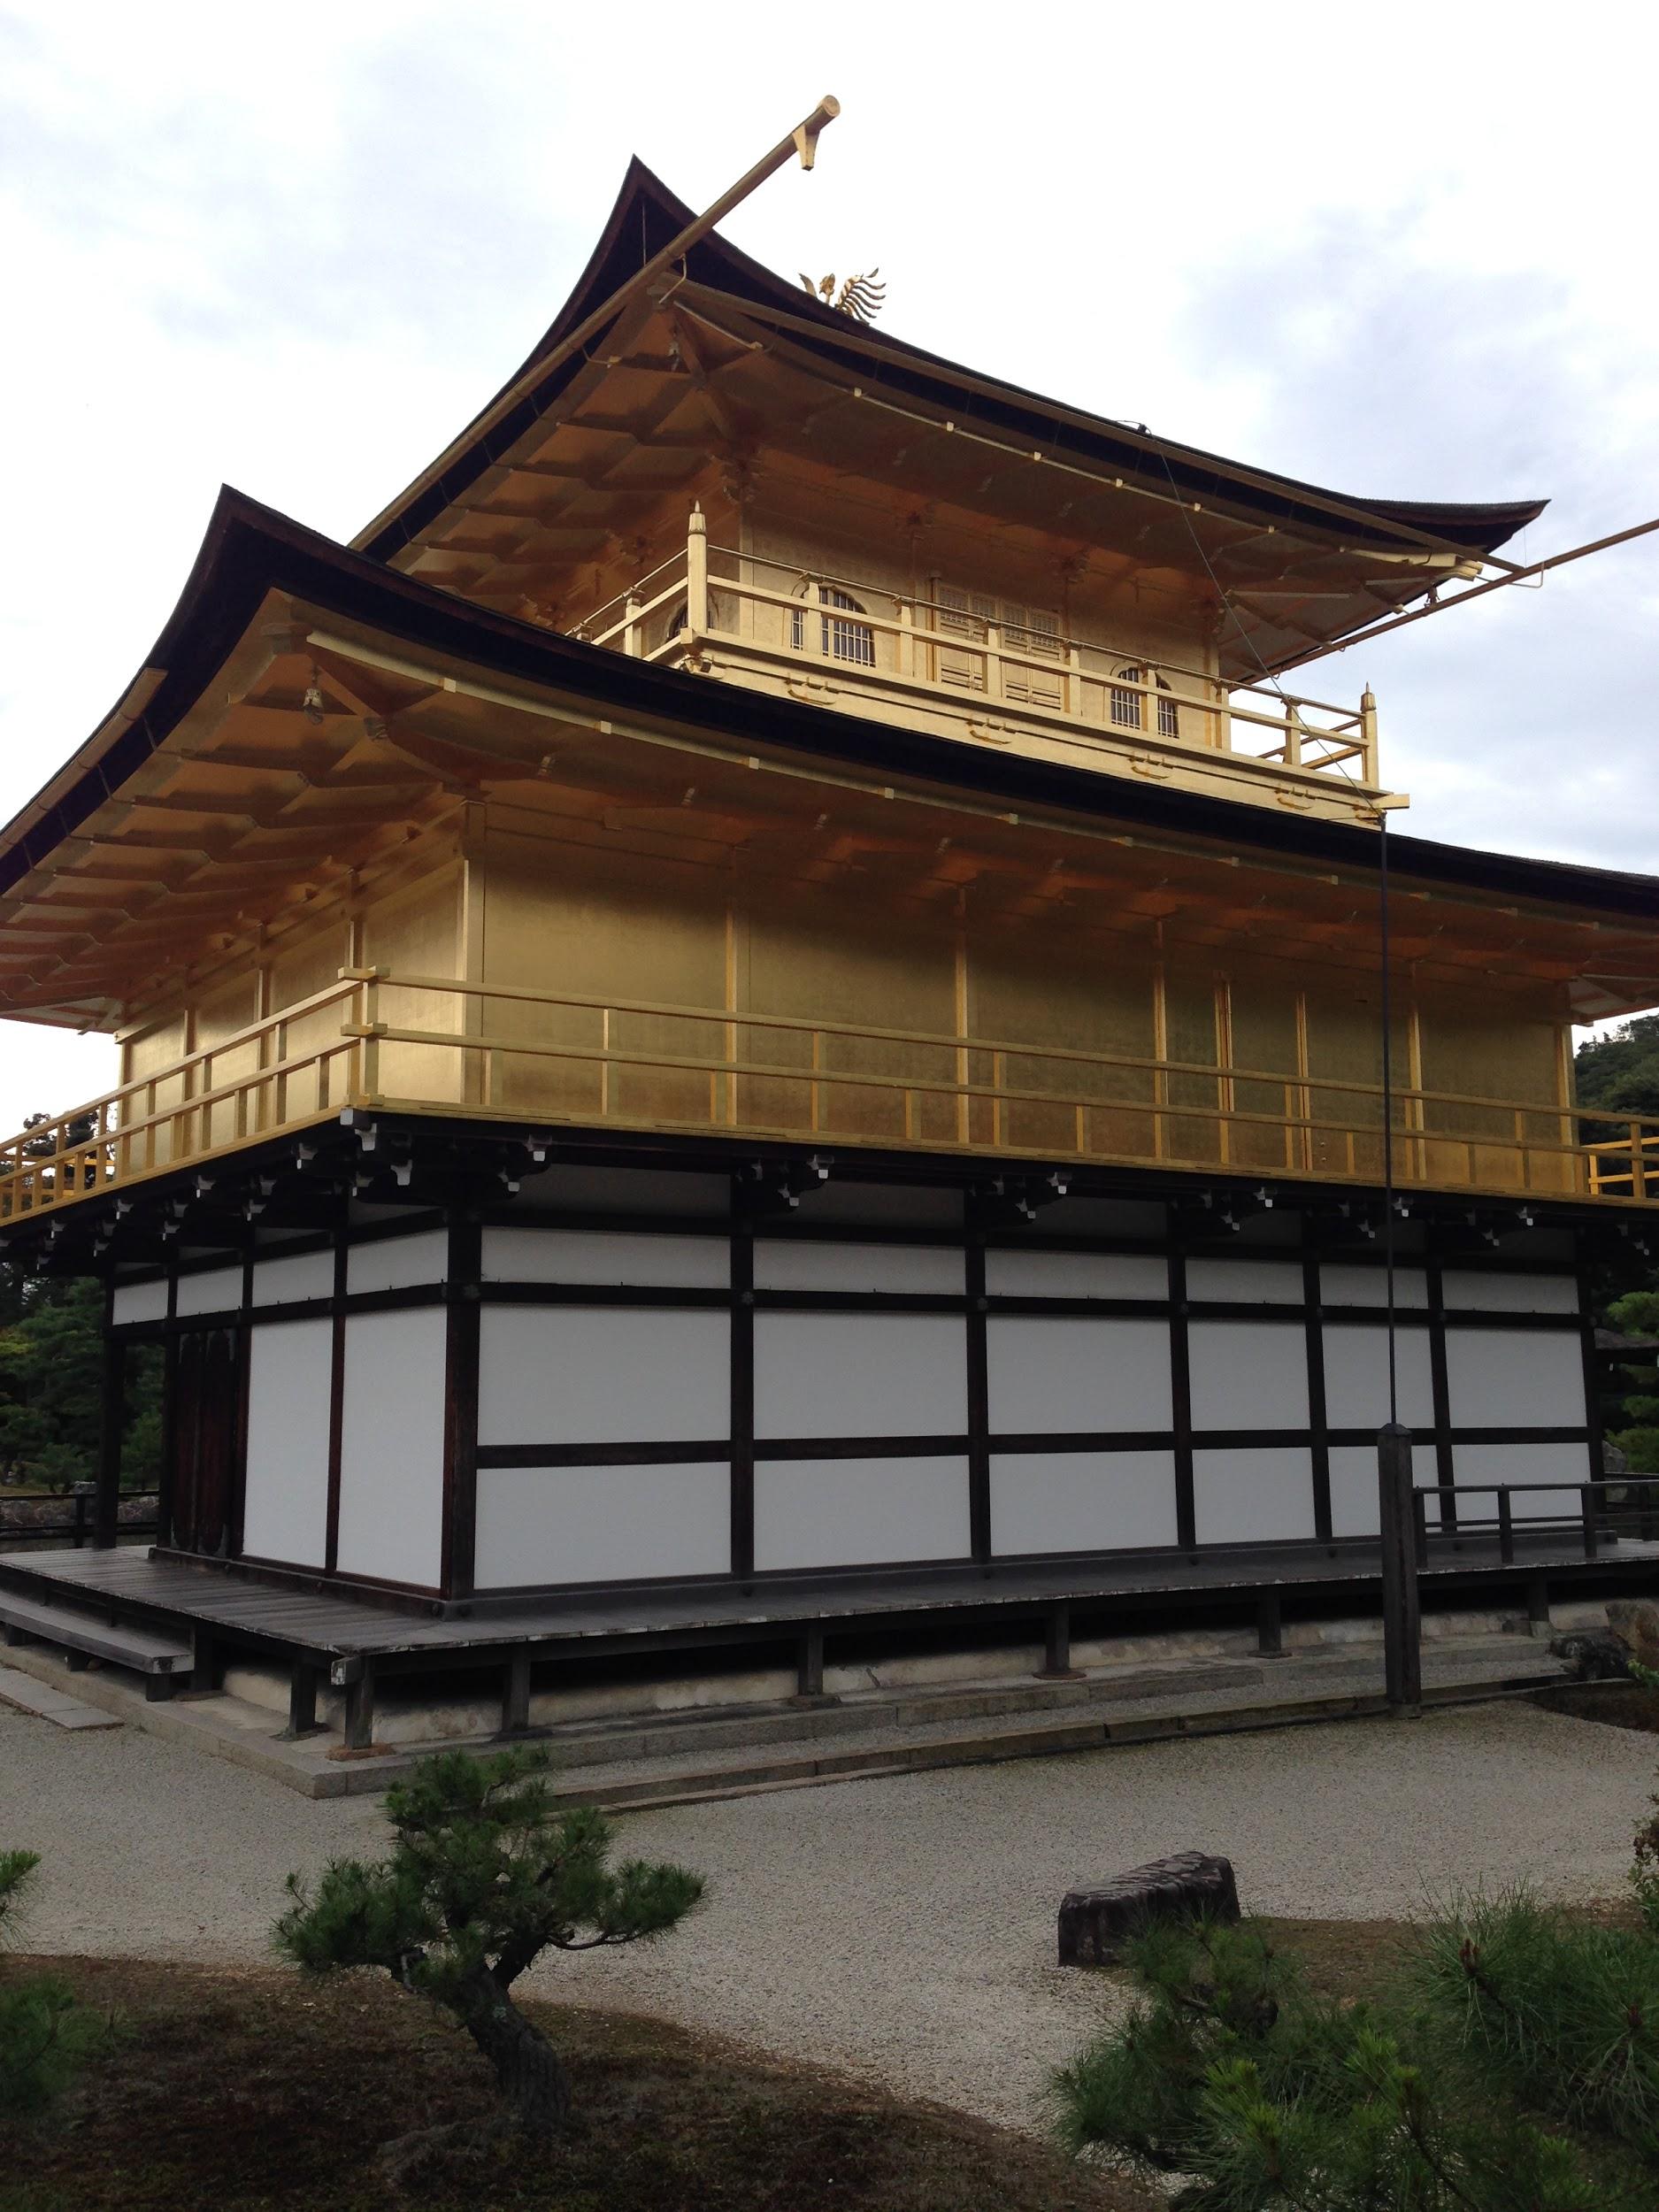 Kinkaku-ji - Golden Pavilion